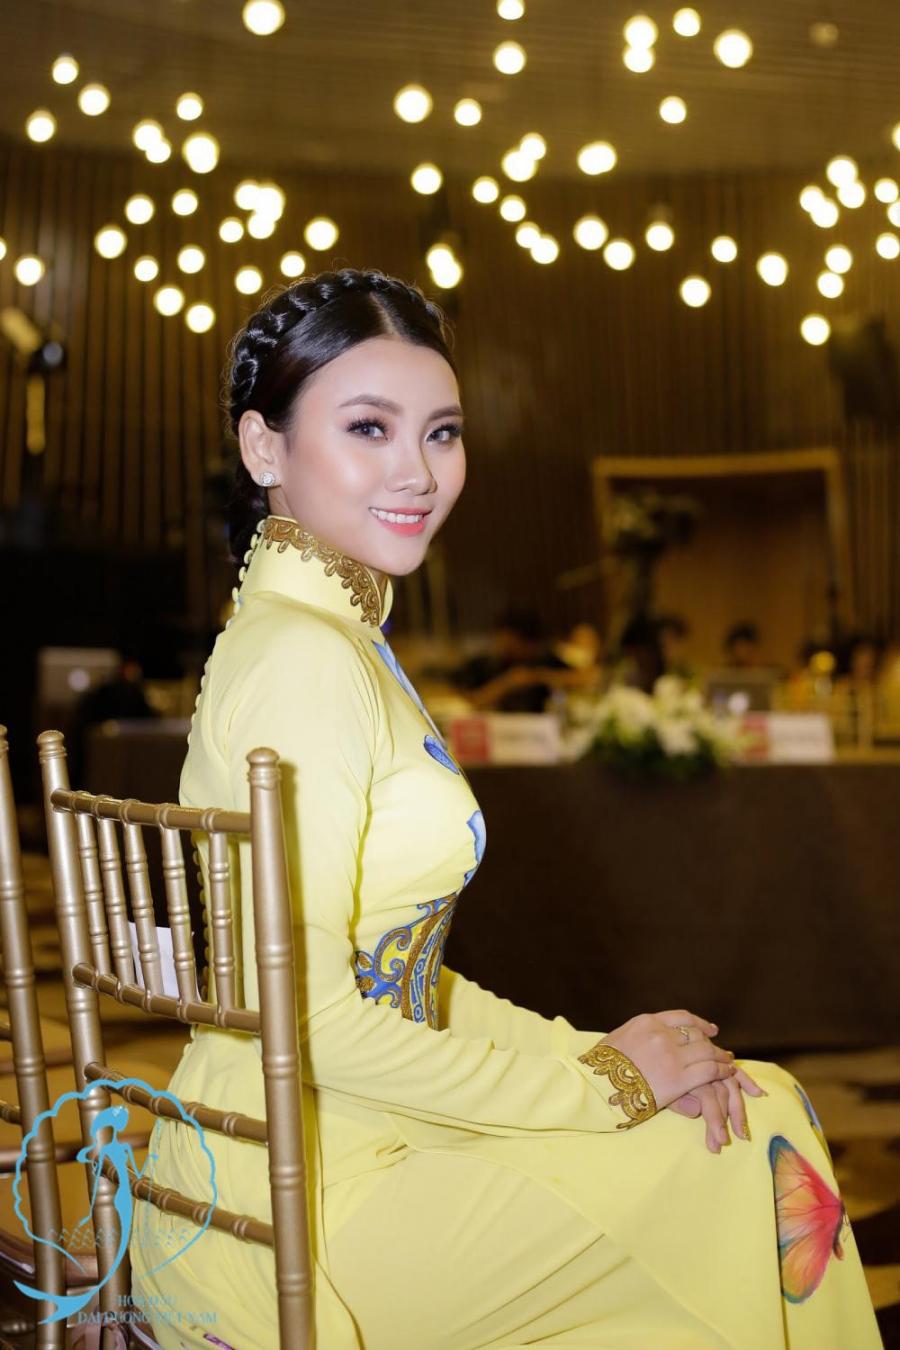 Nhan sac top 10 thi sinh vong online cuoc thi Hoa hau Dai duong 2017 hinh anh 2